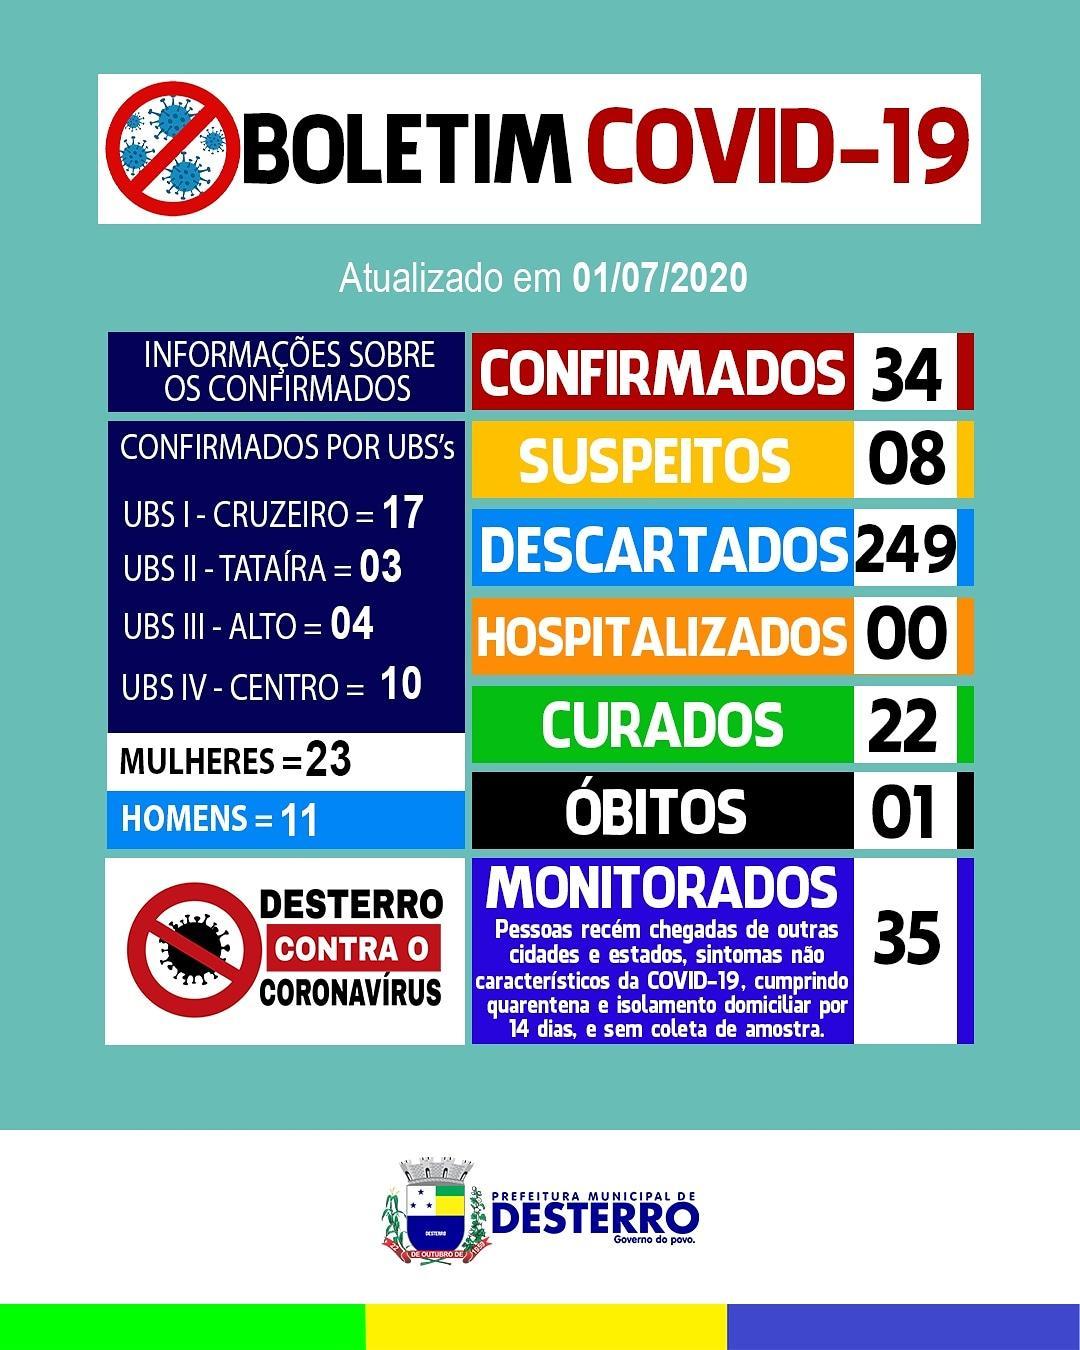 Boletim Covid-19 (01/07/2020)